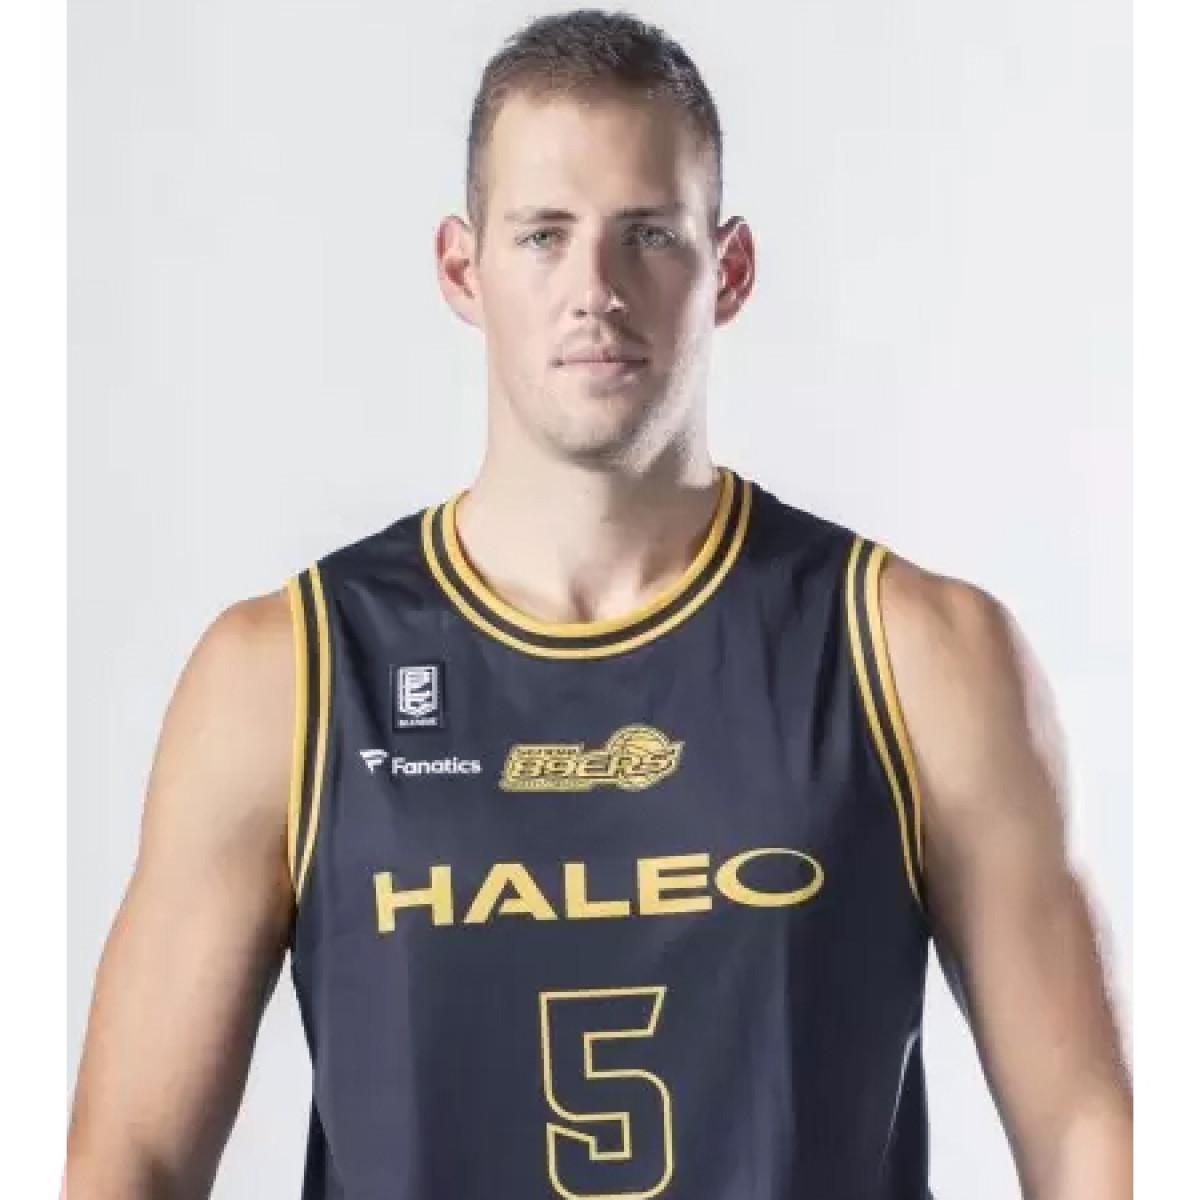 Photo of Daniel Miller, 2019-2020 season